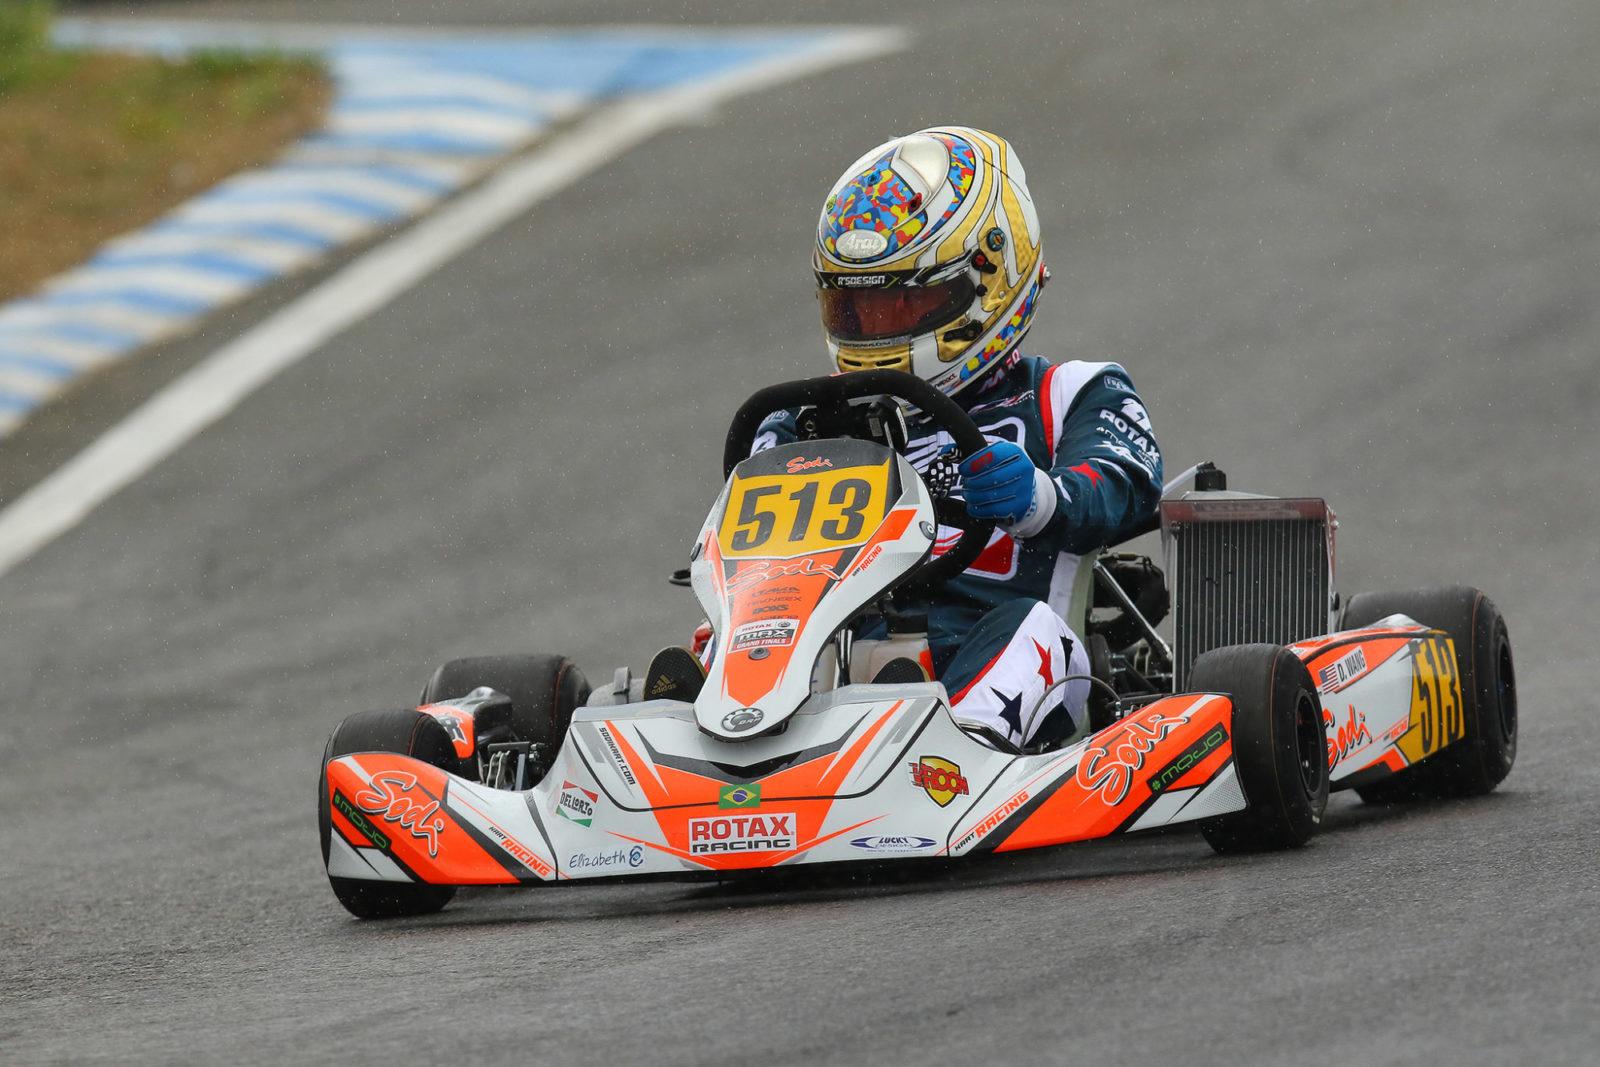 Kart 513 at 2018 Rotax MAX Challenge Grand Finals Brazil